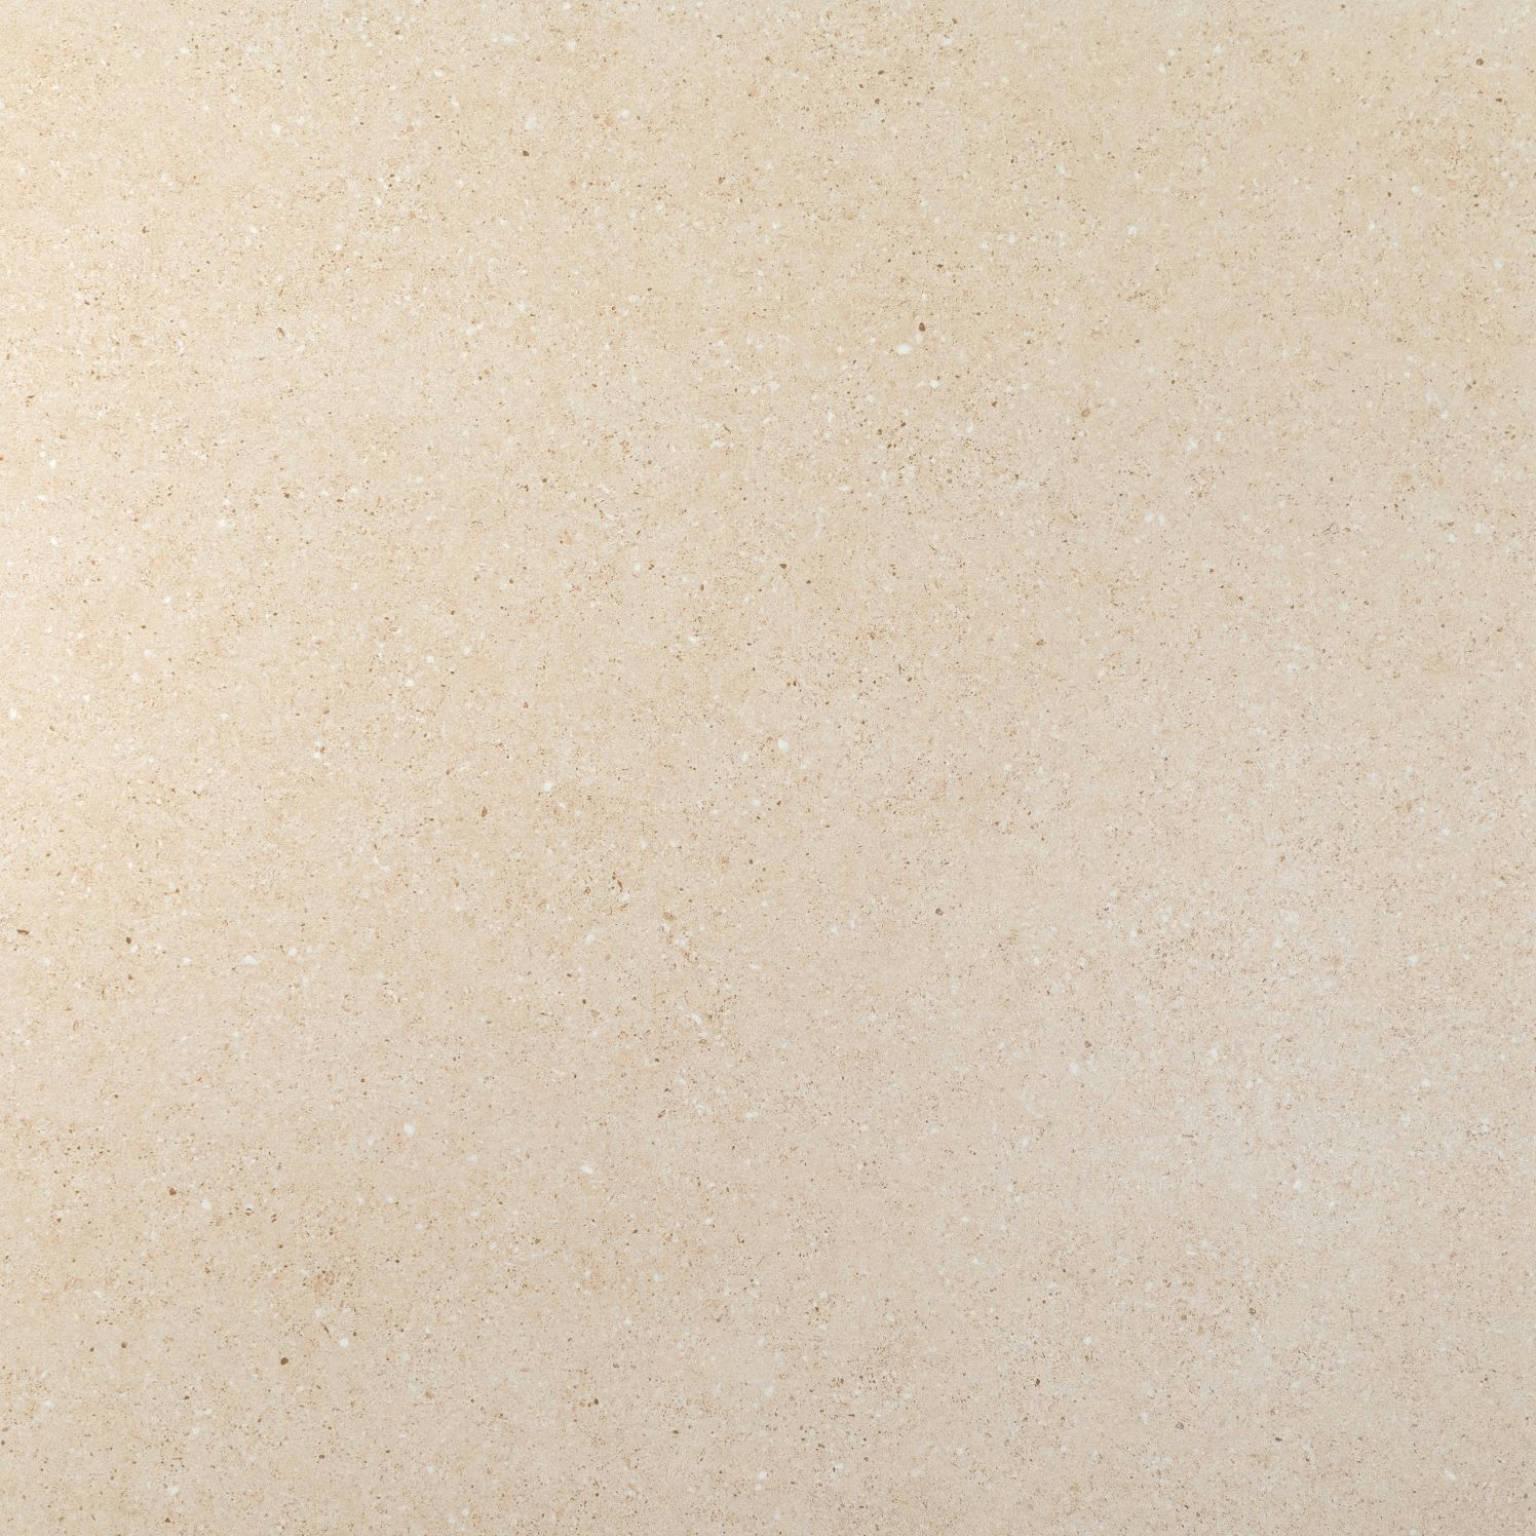 Battuto Sand 60x60 | Newker